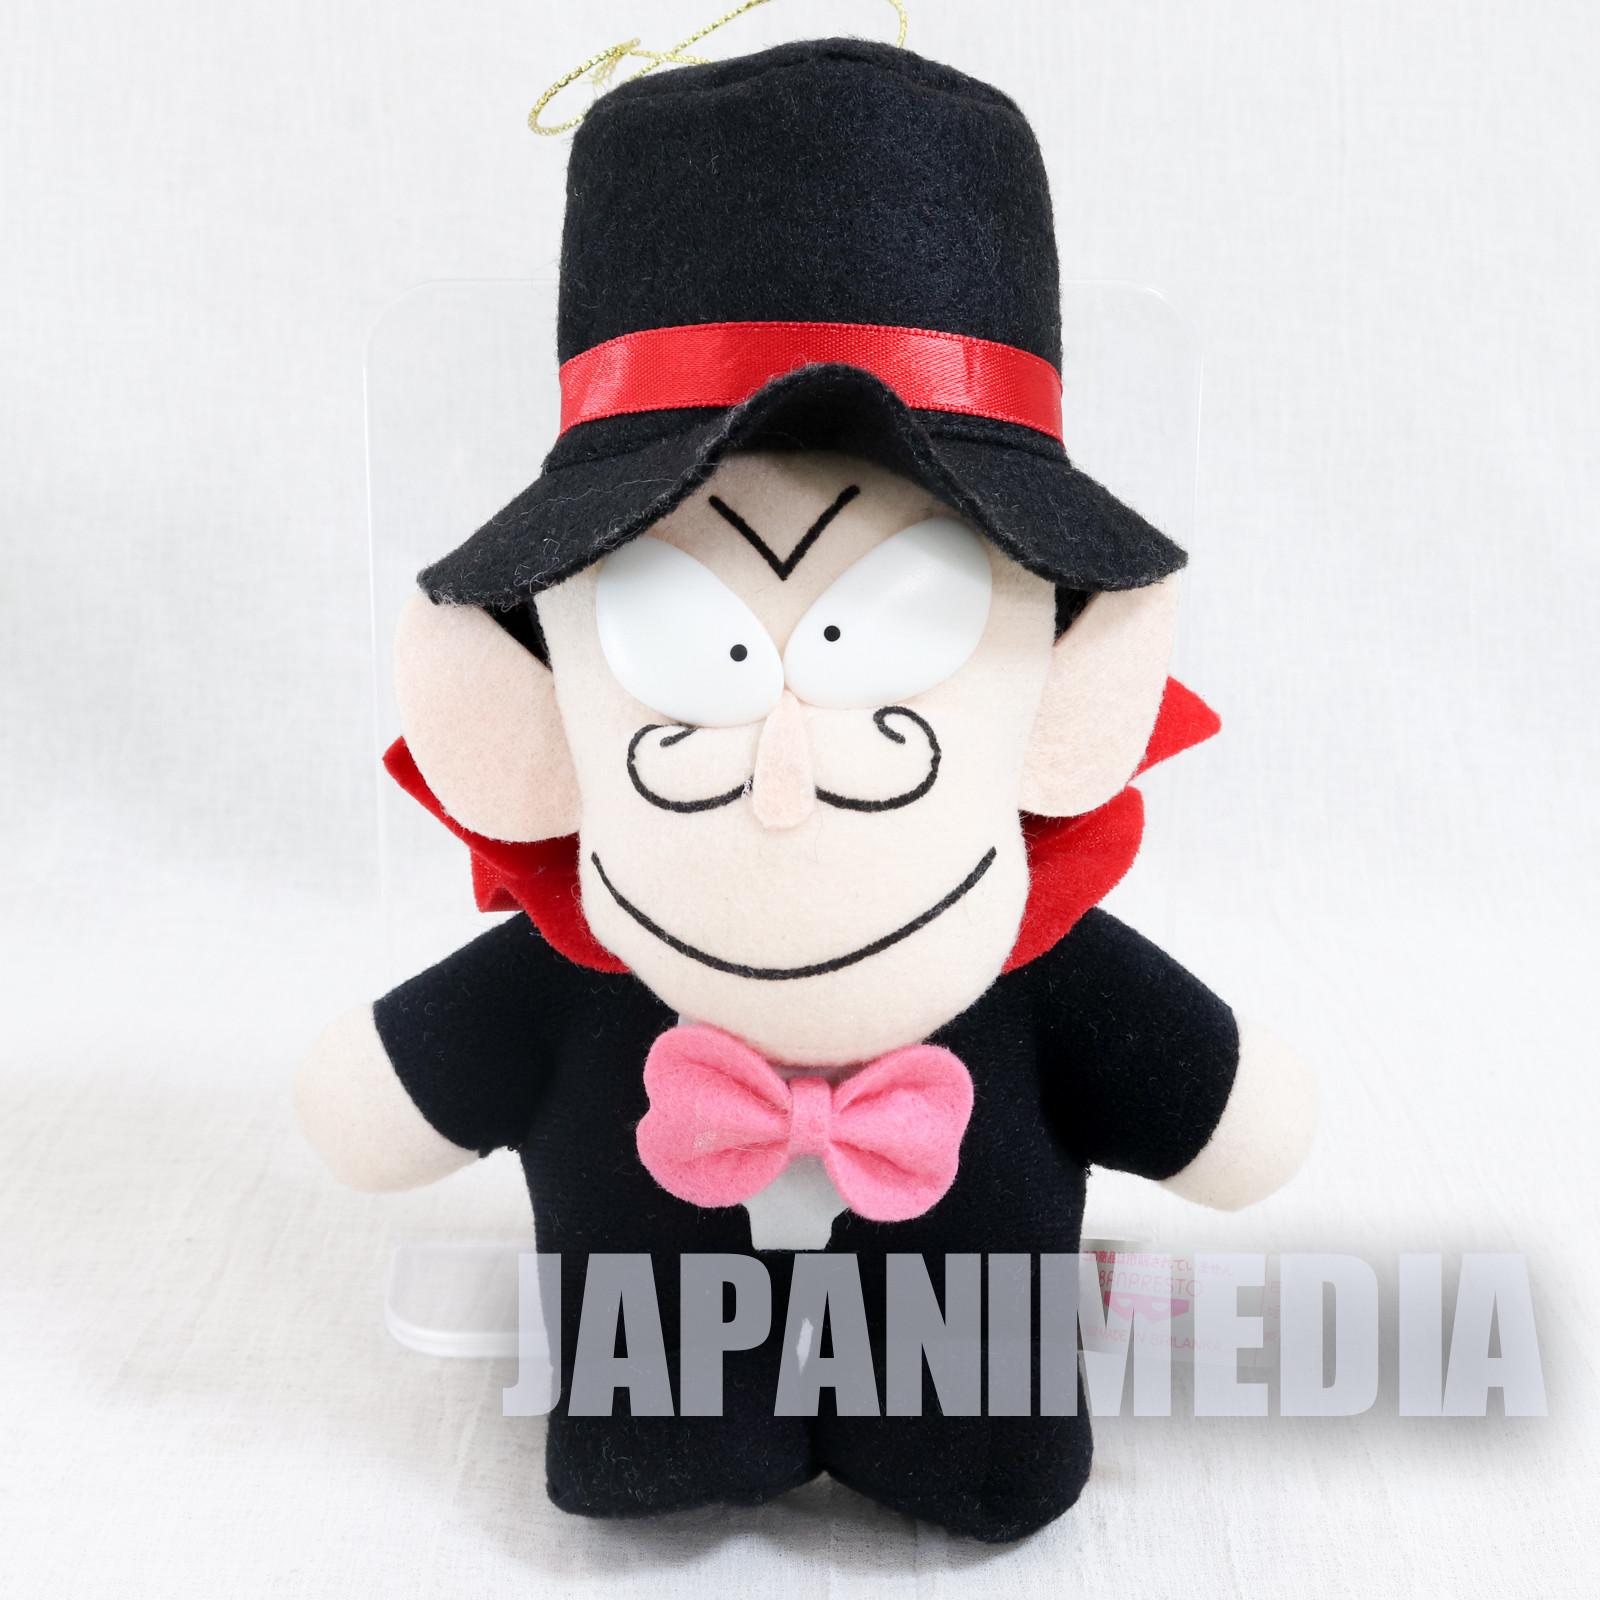 "The Monster Kid Dracula Plush Doll 7"" Banpresto 1992 Fujiko Fujio JAPAN"